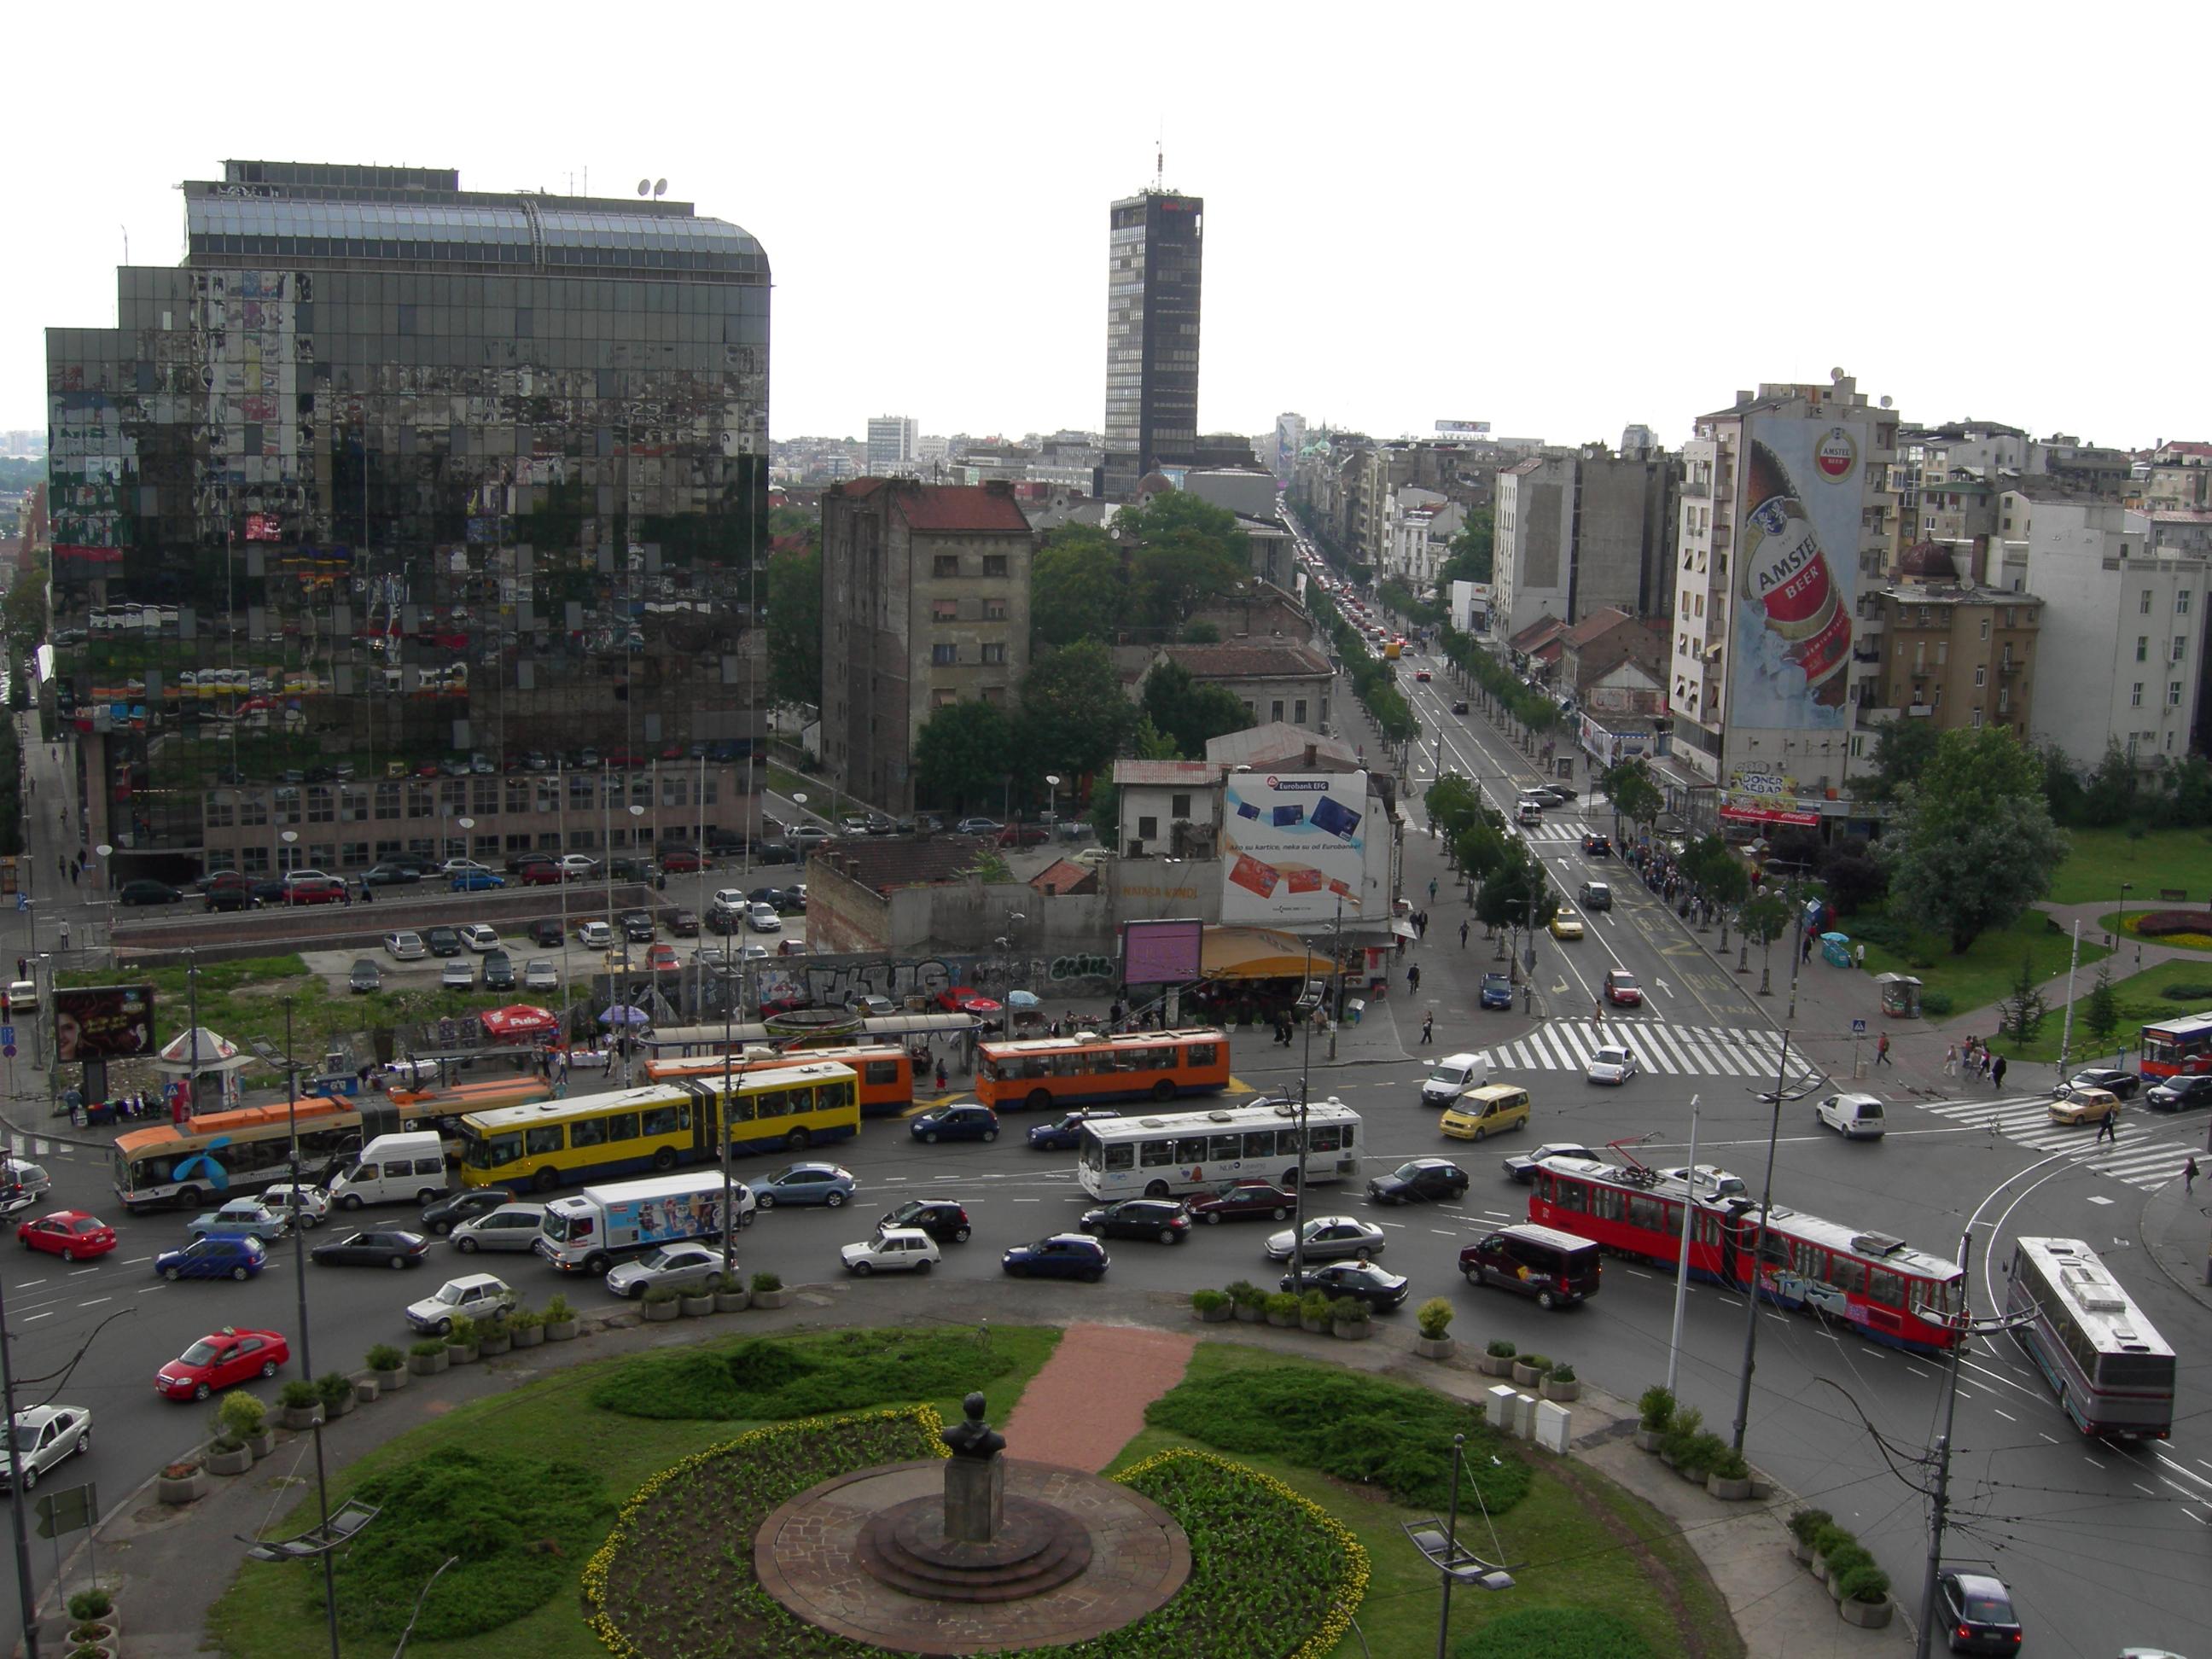 Fotografije gradova Slavija-Beograd-trg_Dimitrija_Tucovica